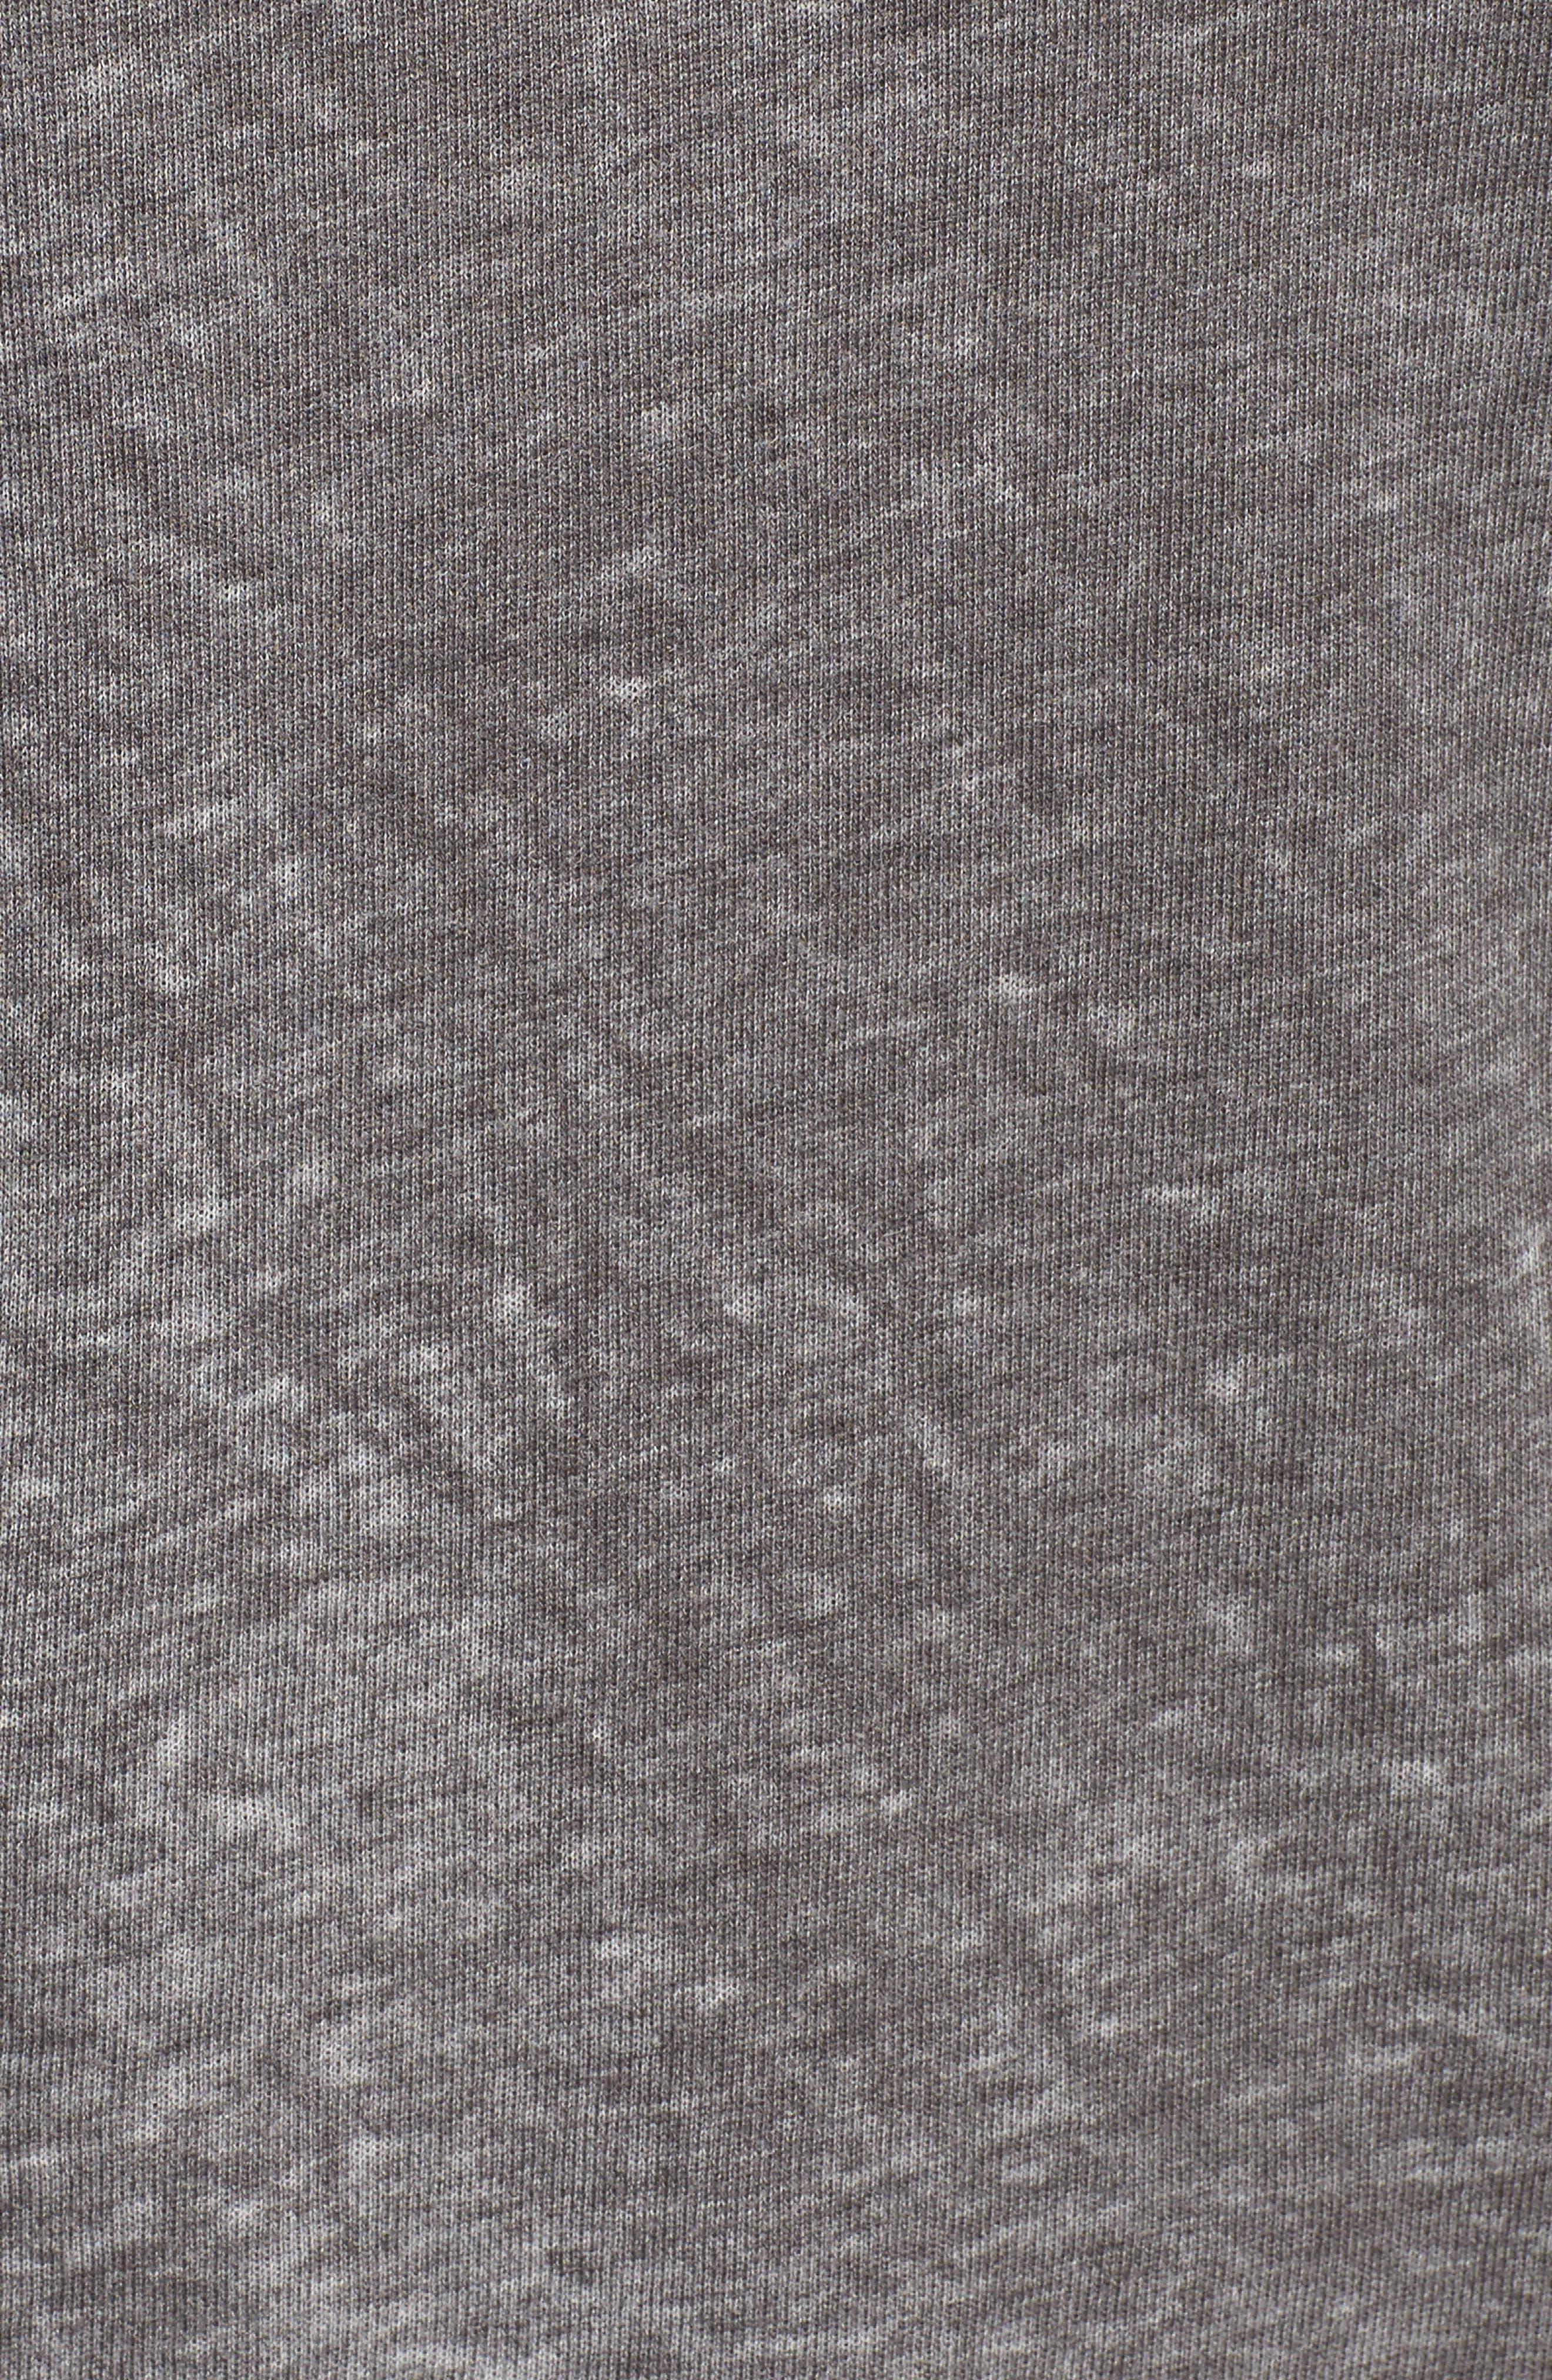 Original Burnout Sweatshirt,                             Alternate thumbnail 5, color,                             005